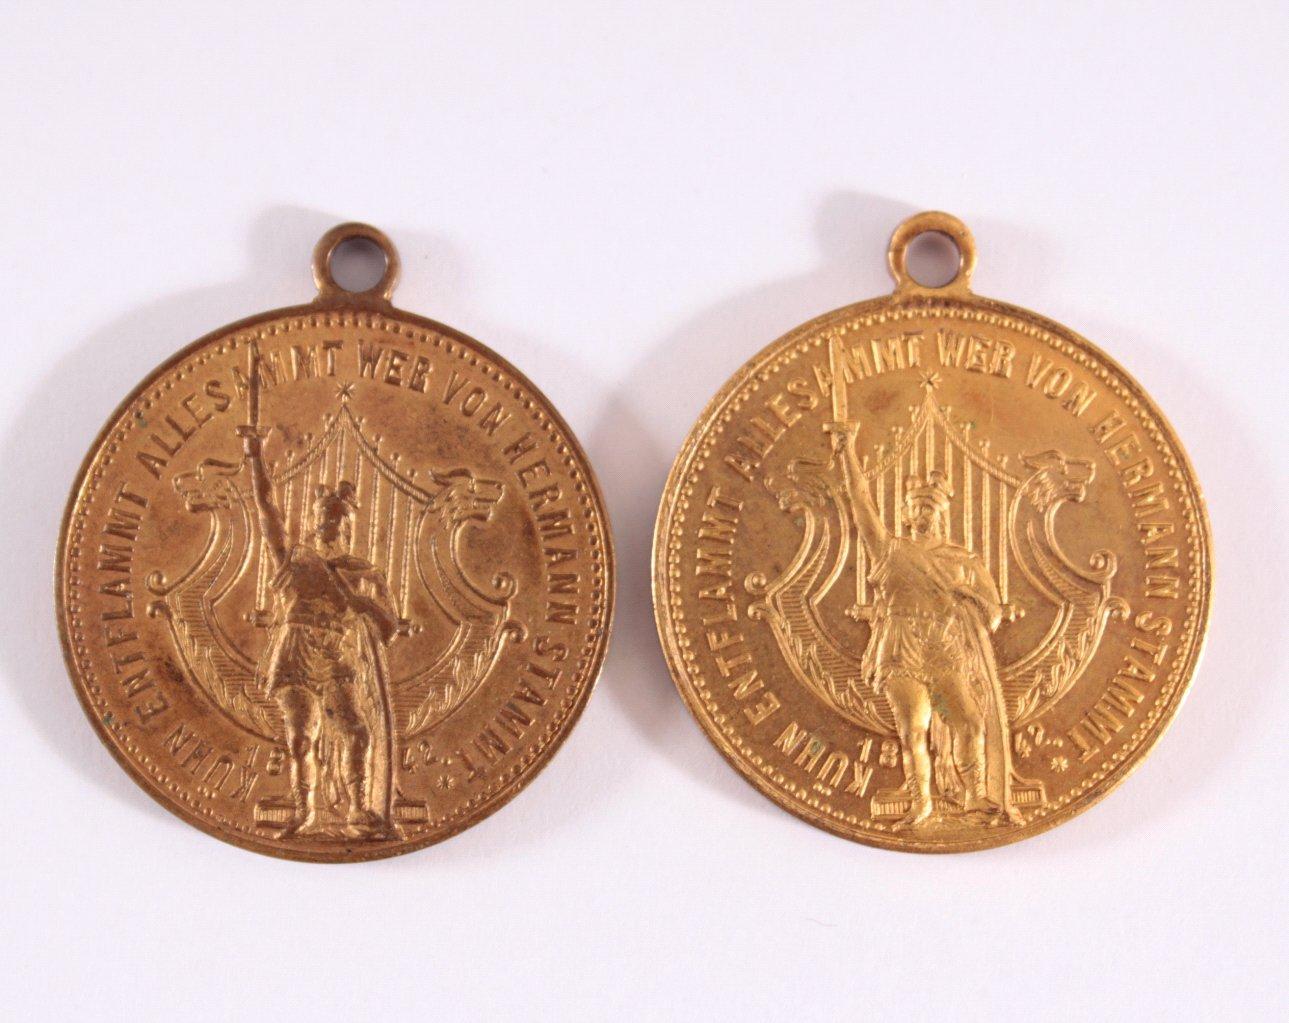 2 Medaillen 50 jährigen Feier, Herrmanns Verein, Frankfurt